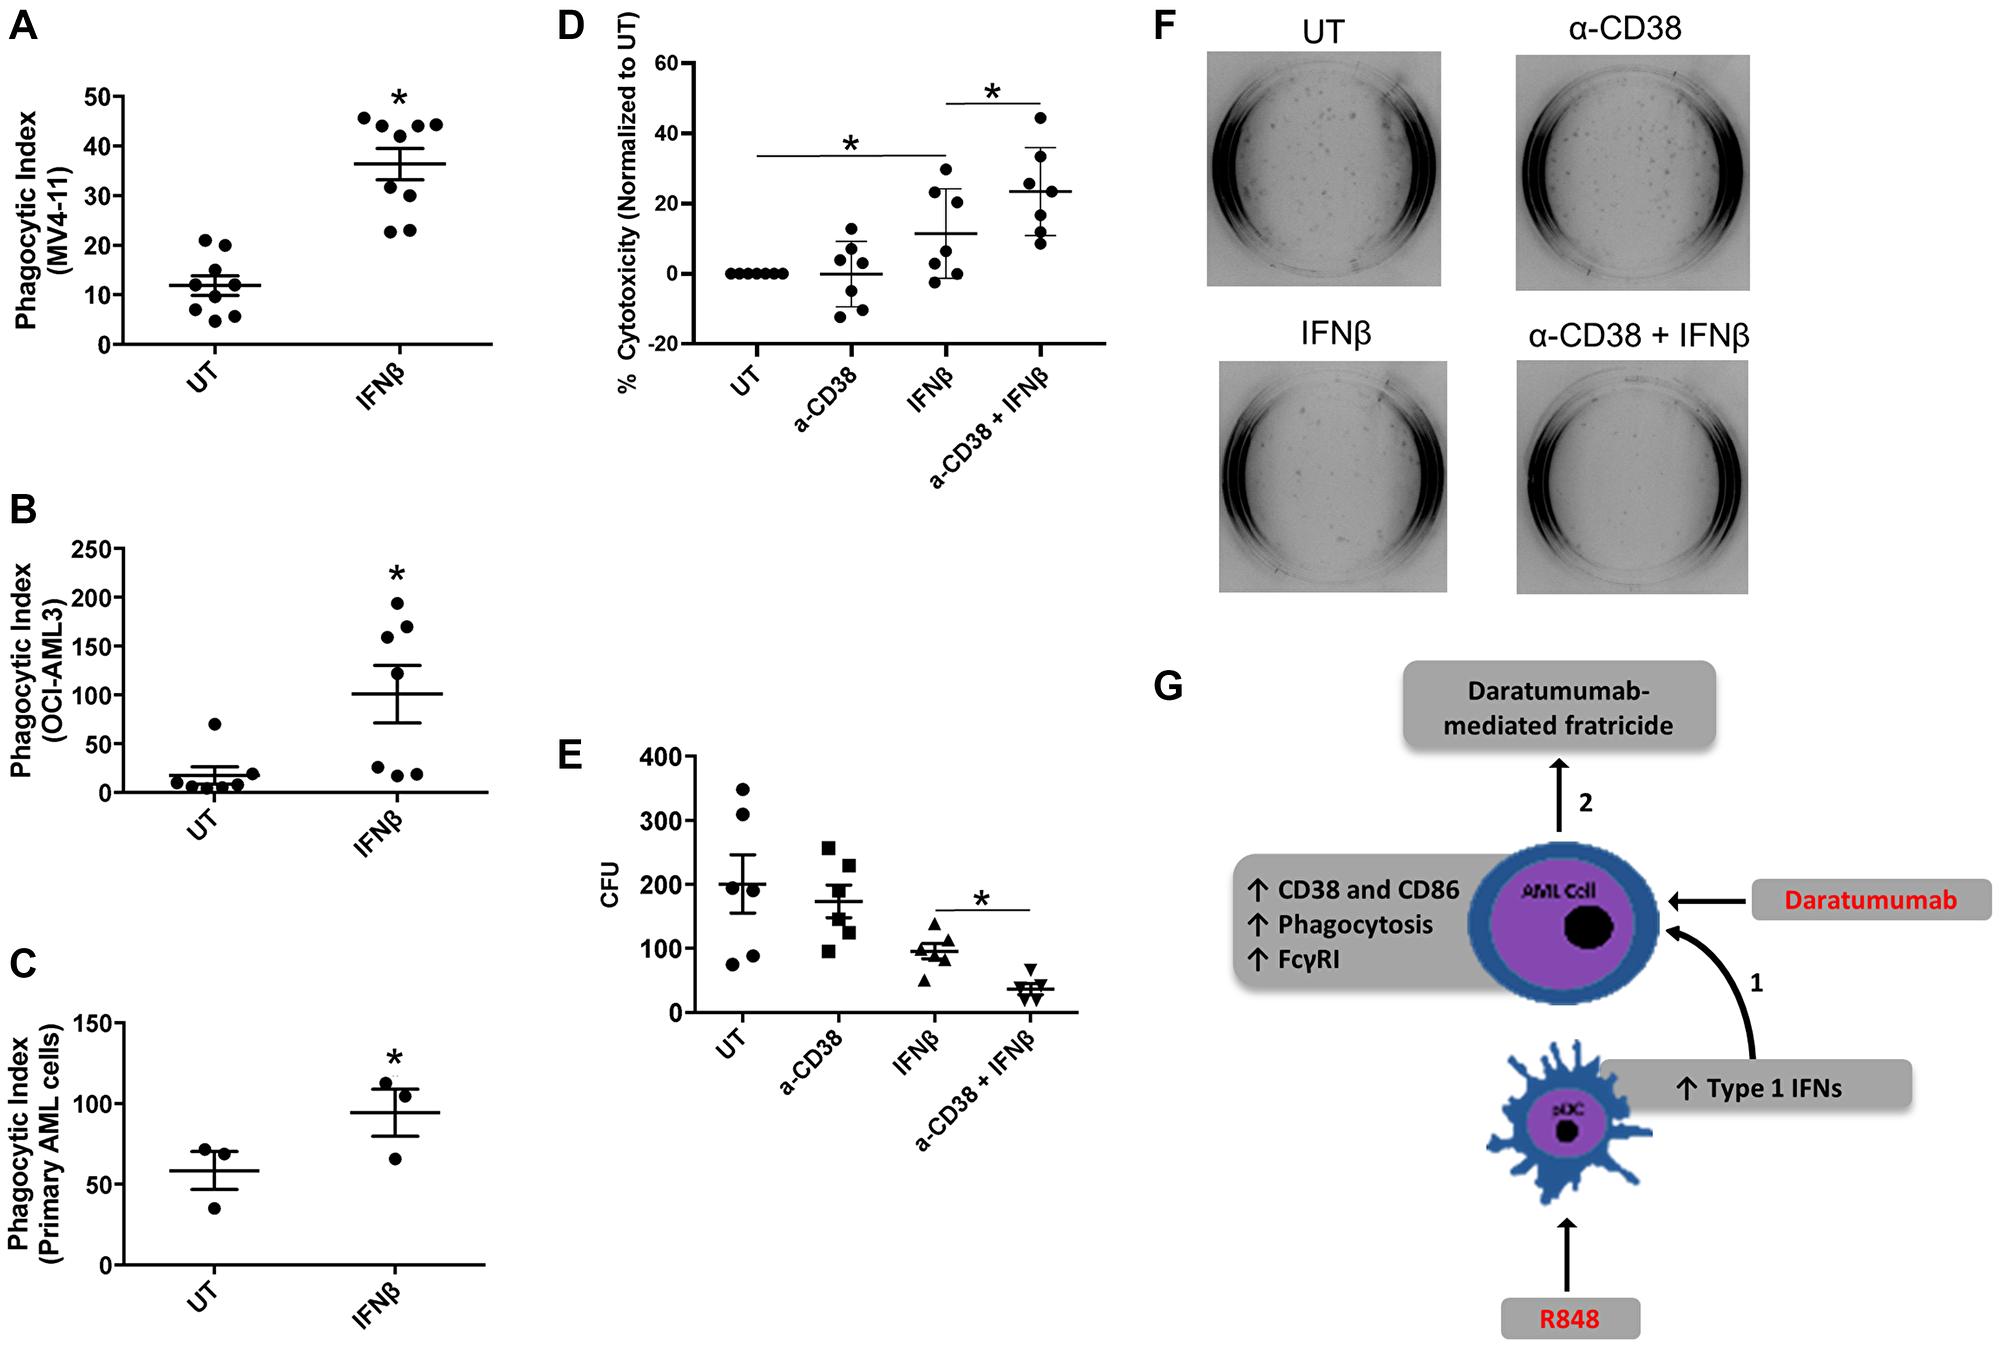 IFNβ-induced AML-cell cytotoxicity is enhanced with anti-CD38 antibody daratumumab.